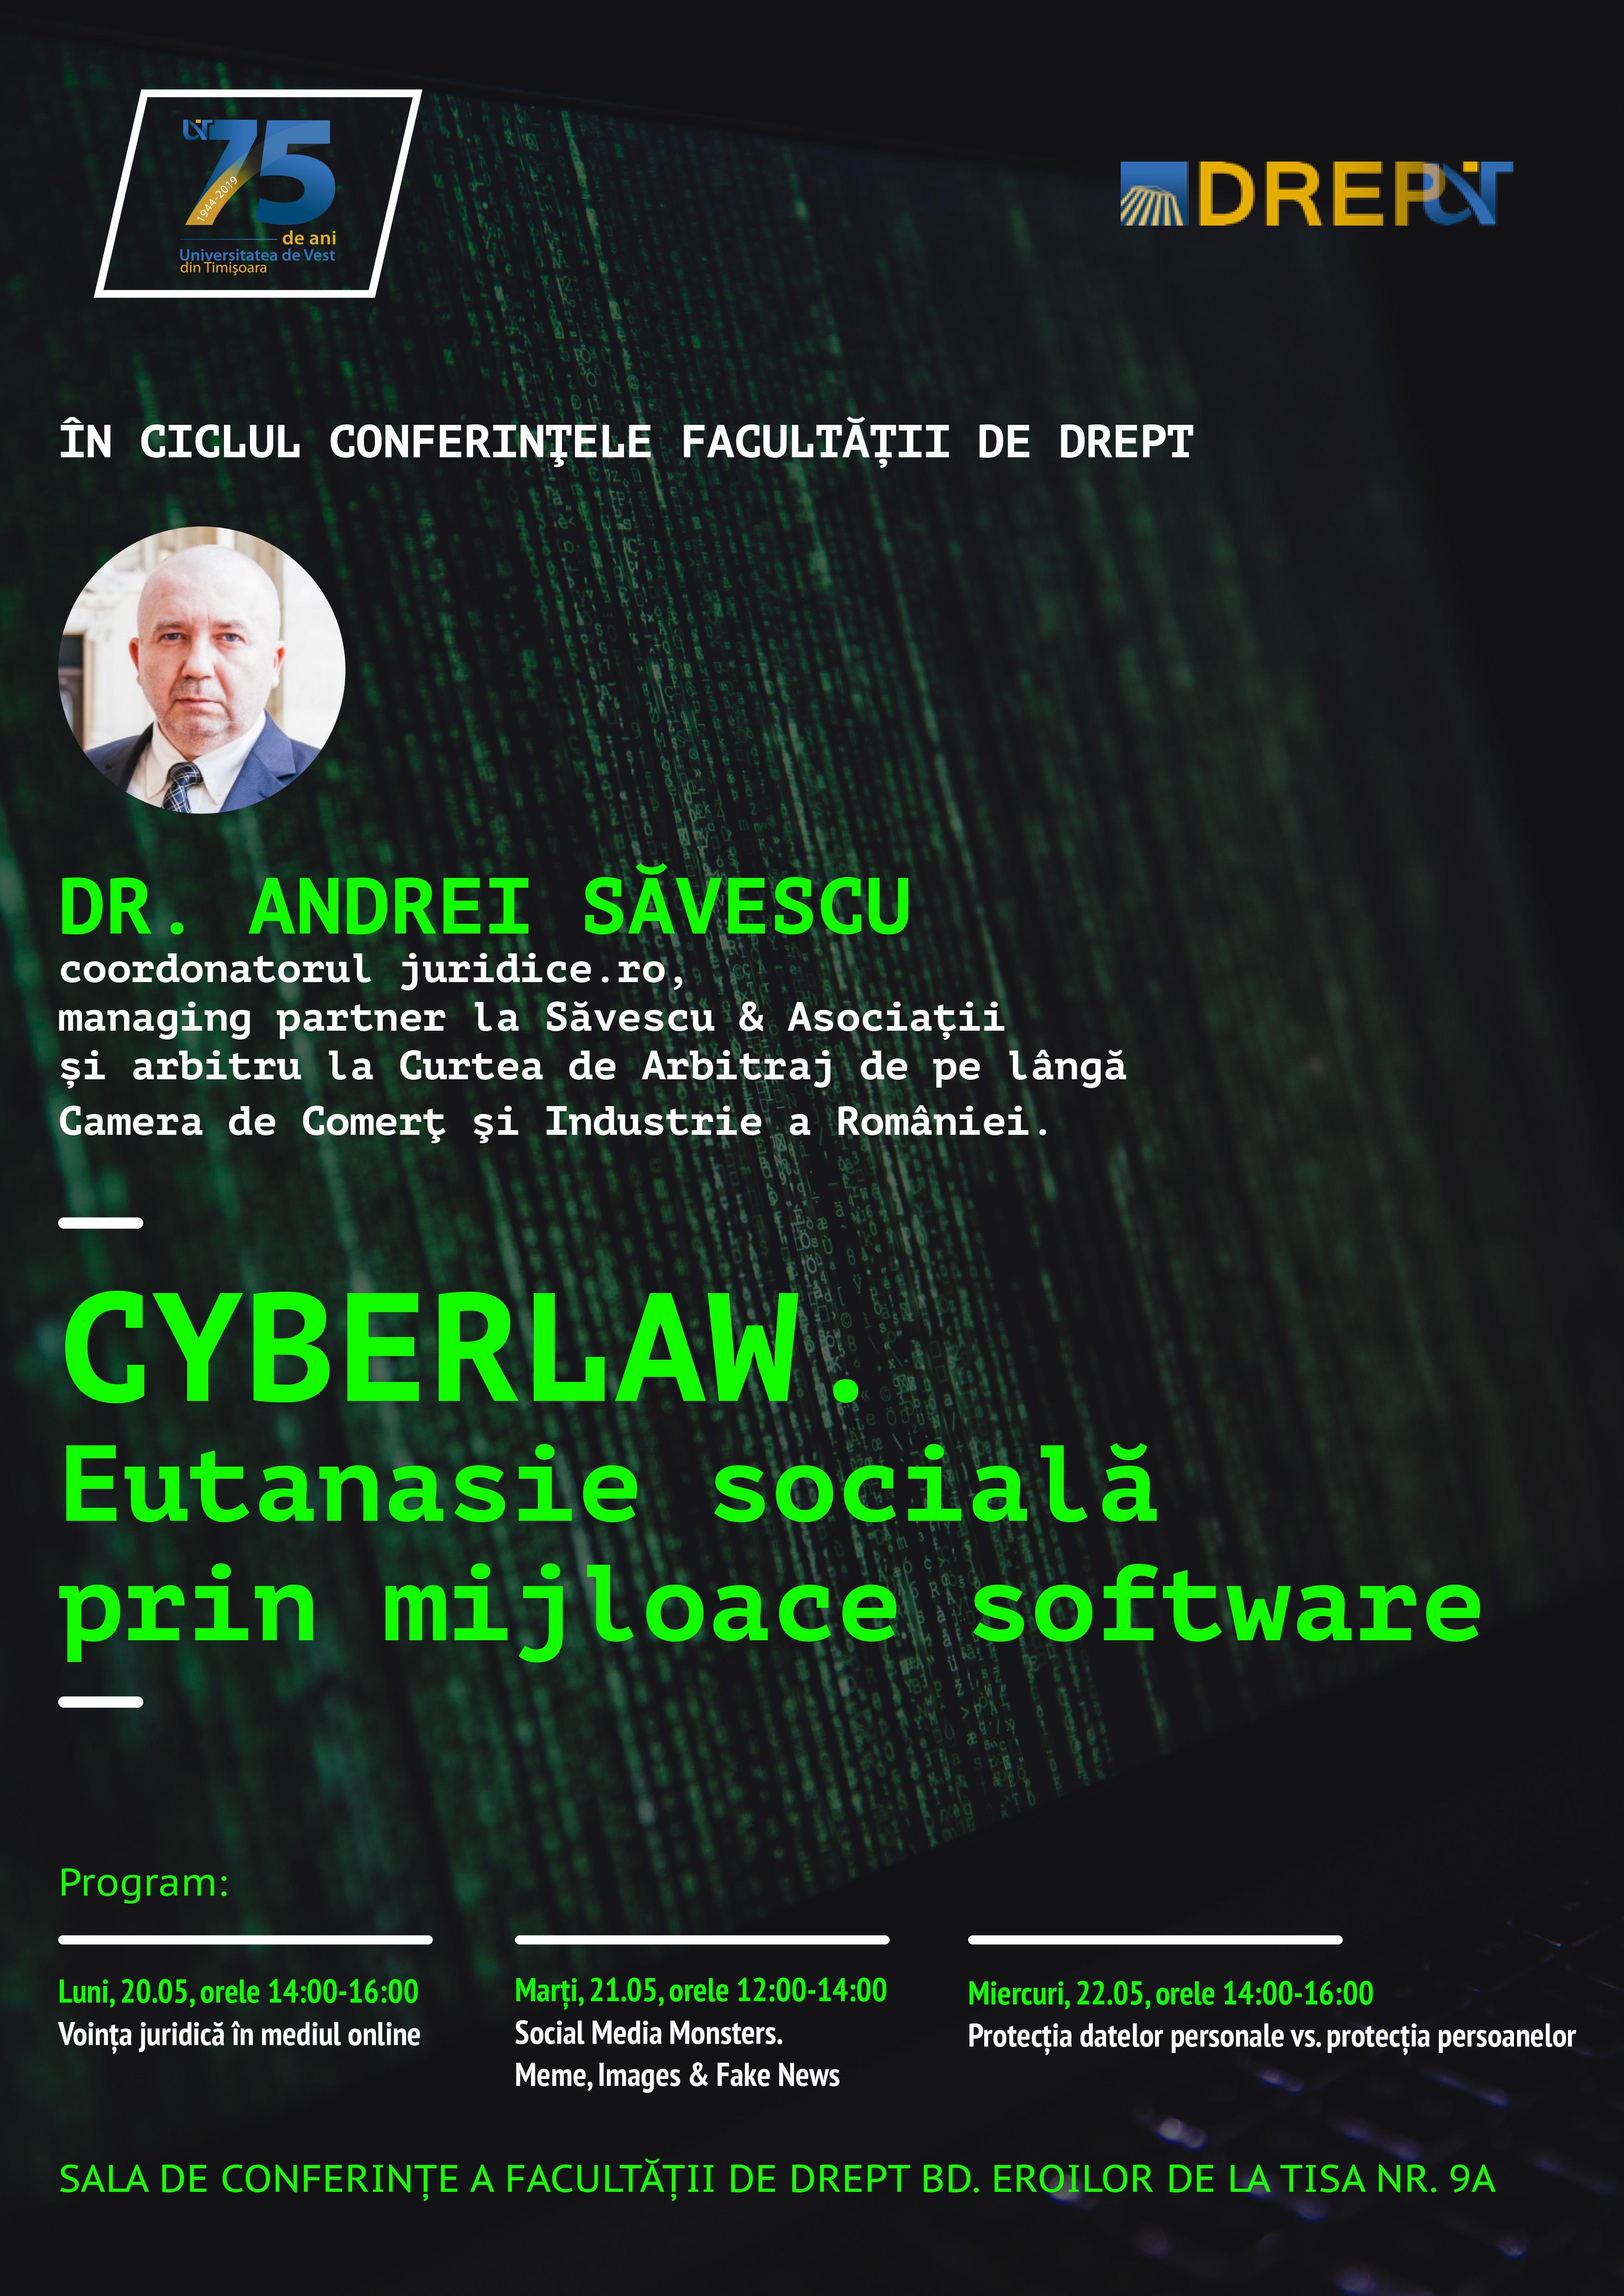 CYBERLAW Andrei Savescu Timisoara